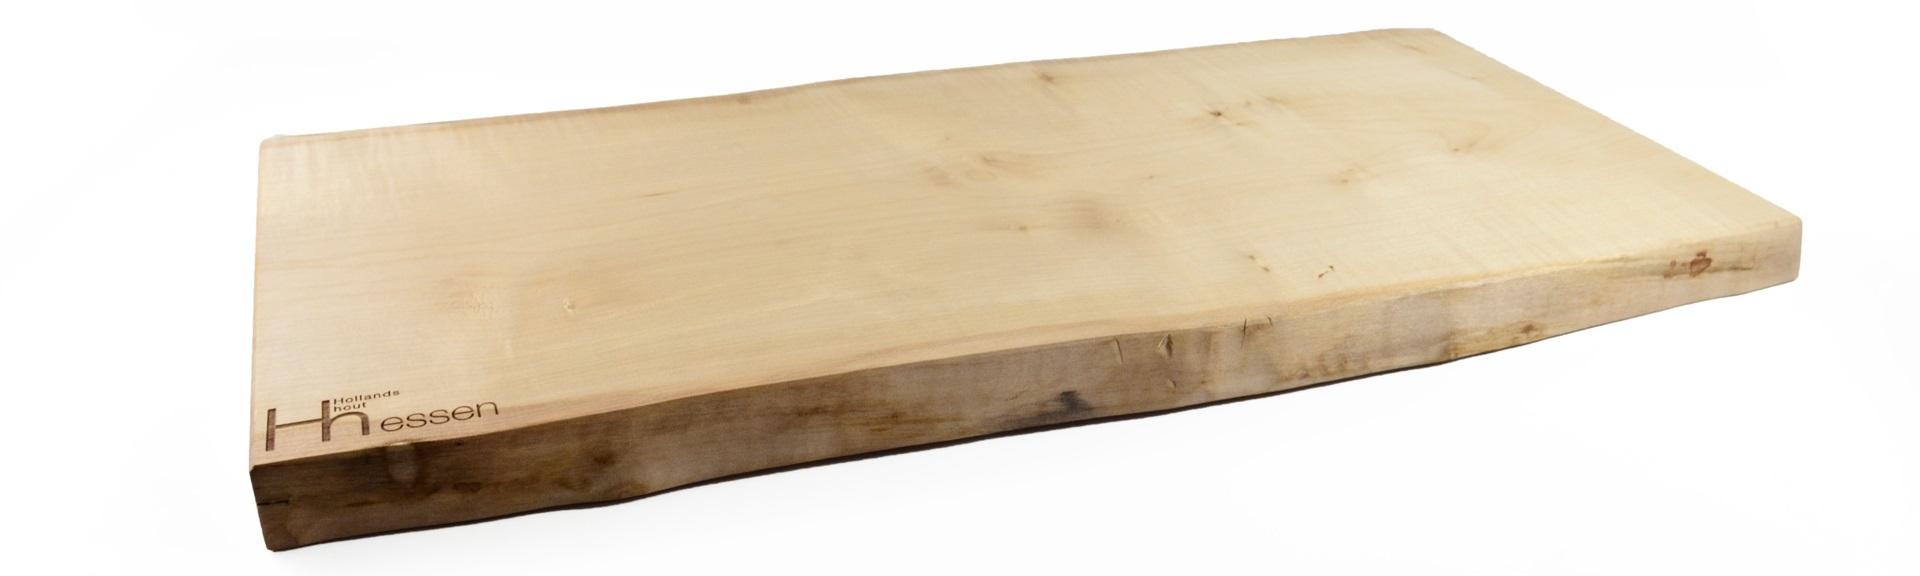 Hollandshout tapasplank essen 80cm - Kleur plank ...